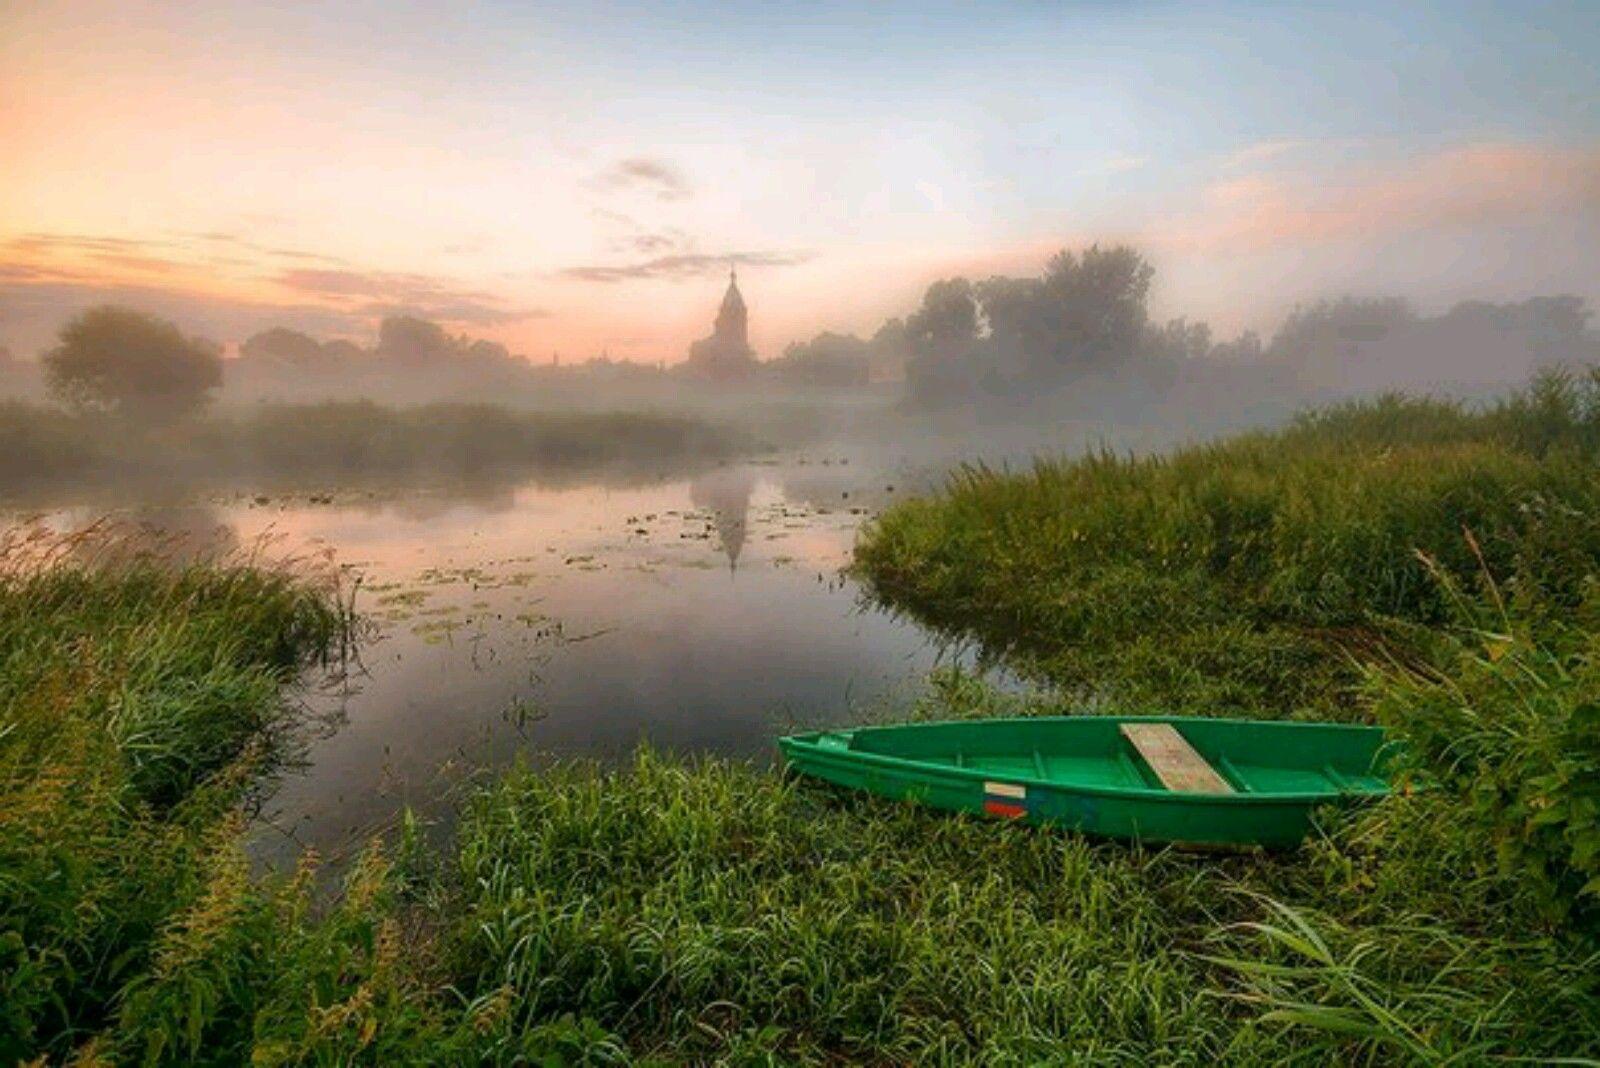 Ранняя рыбалка   Фото пейзажа, Рыбалка, Марио